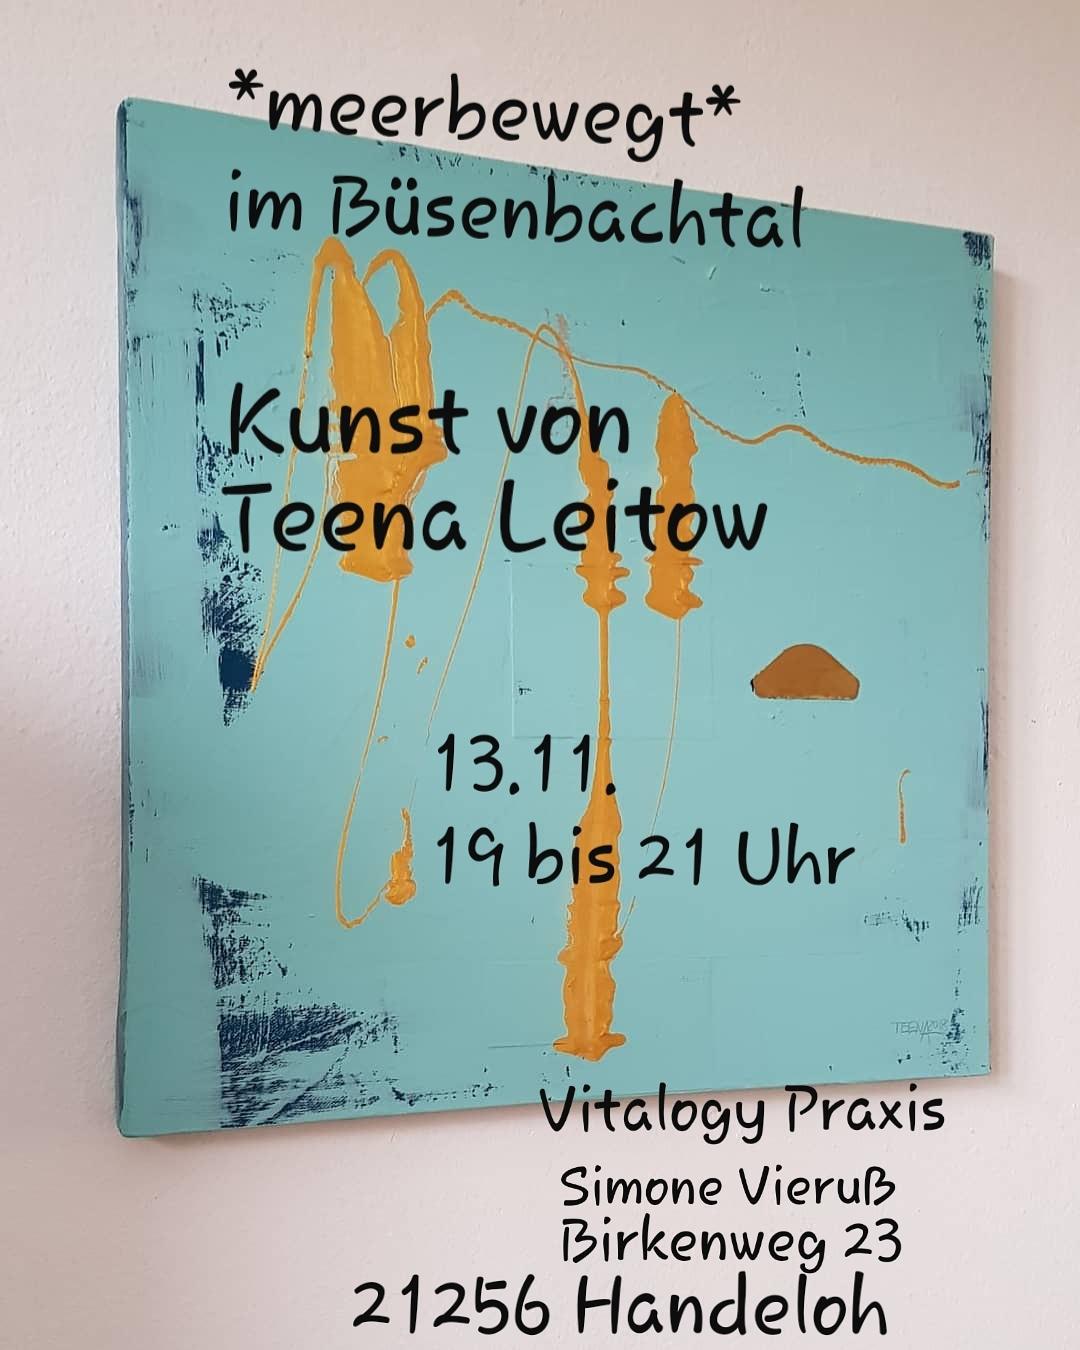 meerbewegt, Kunst, Teena Leitow, Büsenbachtal, Simone Vieruß, Ausstellung, Nordheide